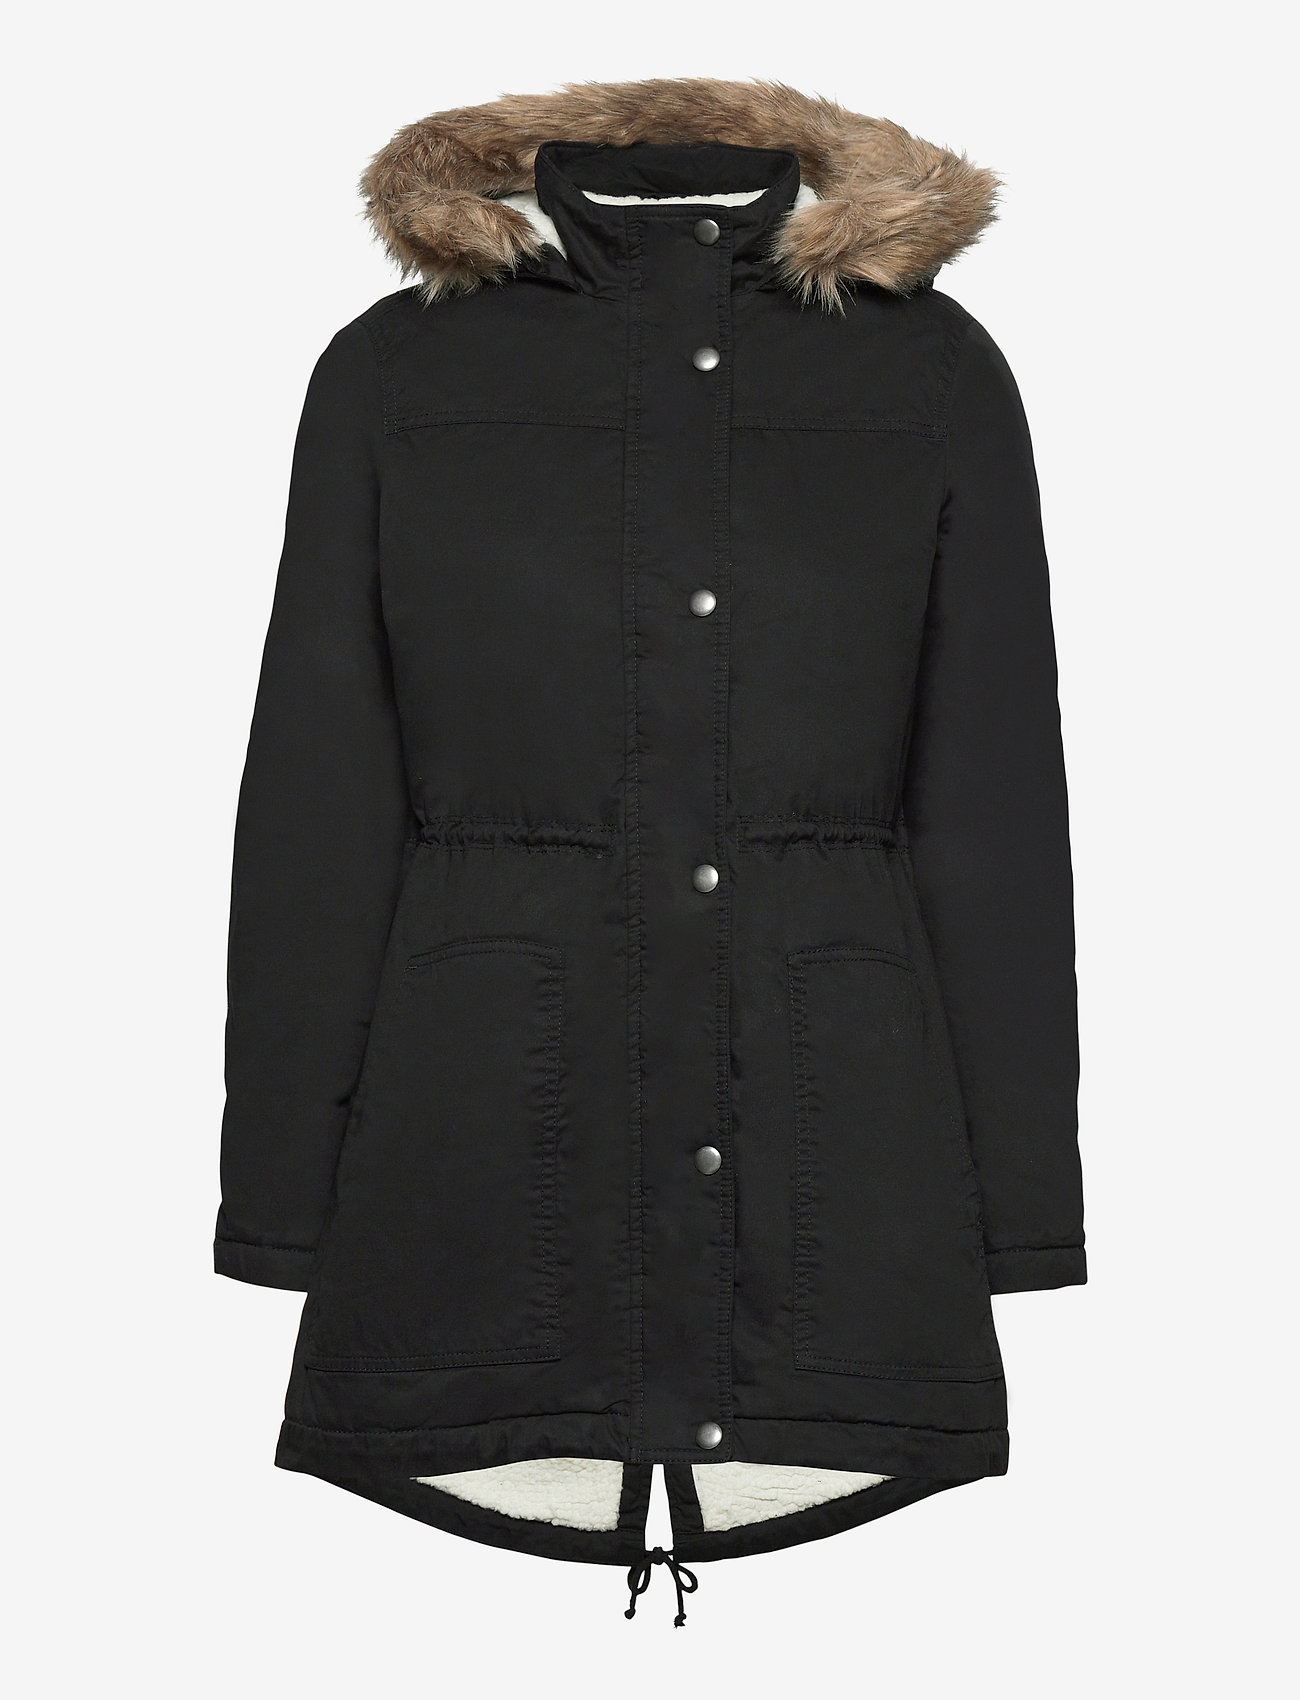 GAP - V-SHERPA PARKA - parka coats - true black v2 2 - 0